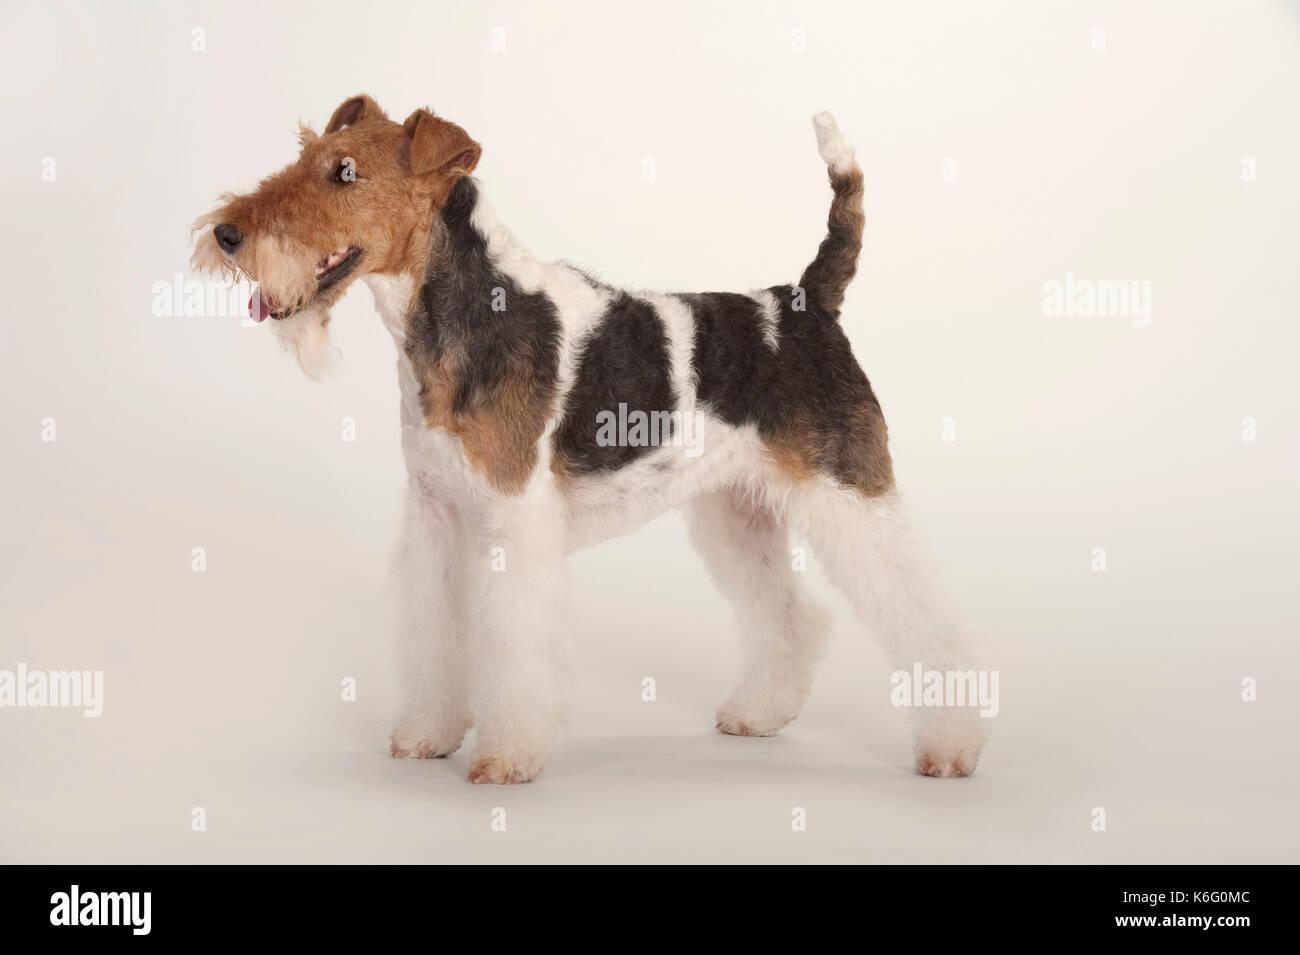 Fox Terrier Dog Stockfotos & Fox Terrier Dog Bilder - Alamy